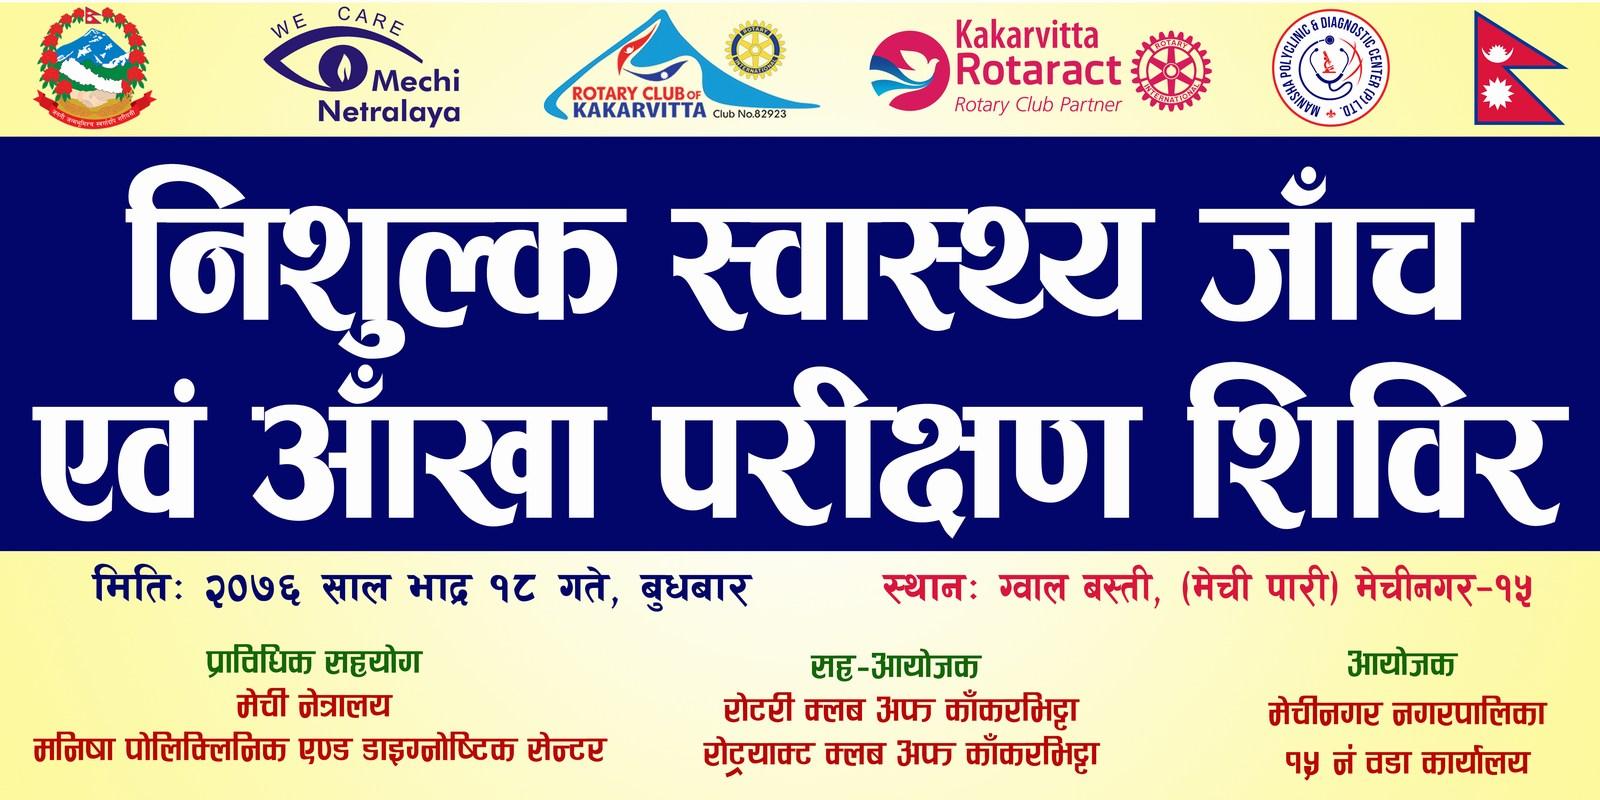 Free-Health-Camp-Eye-Screening-at-Gwala-Basti-Mechinagar-15-Jhapa-Nepal-Rotary-Club-of-Kakarvitta-1